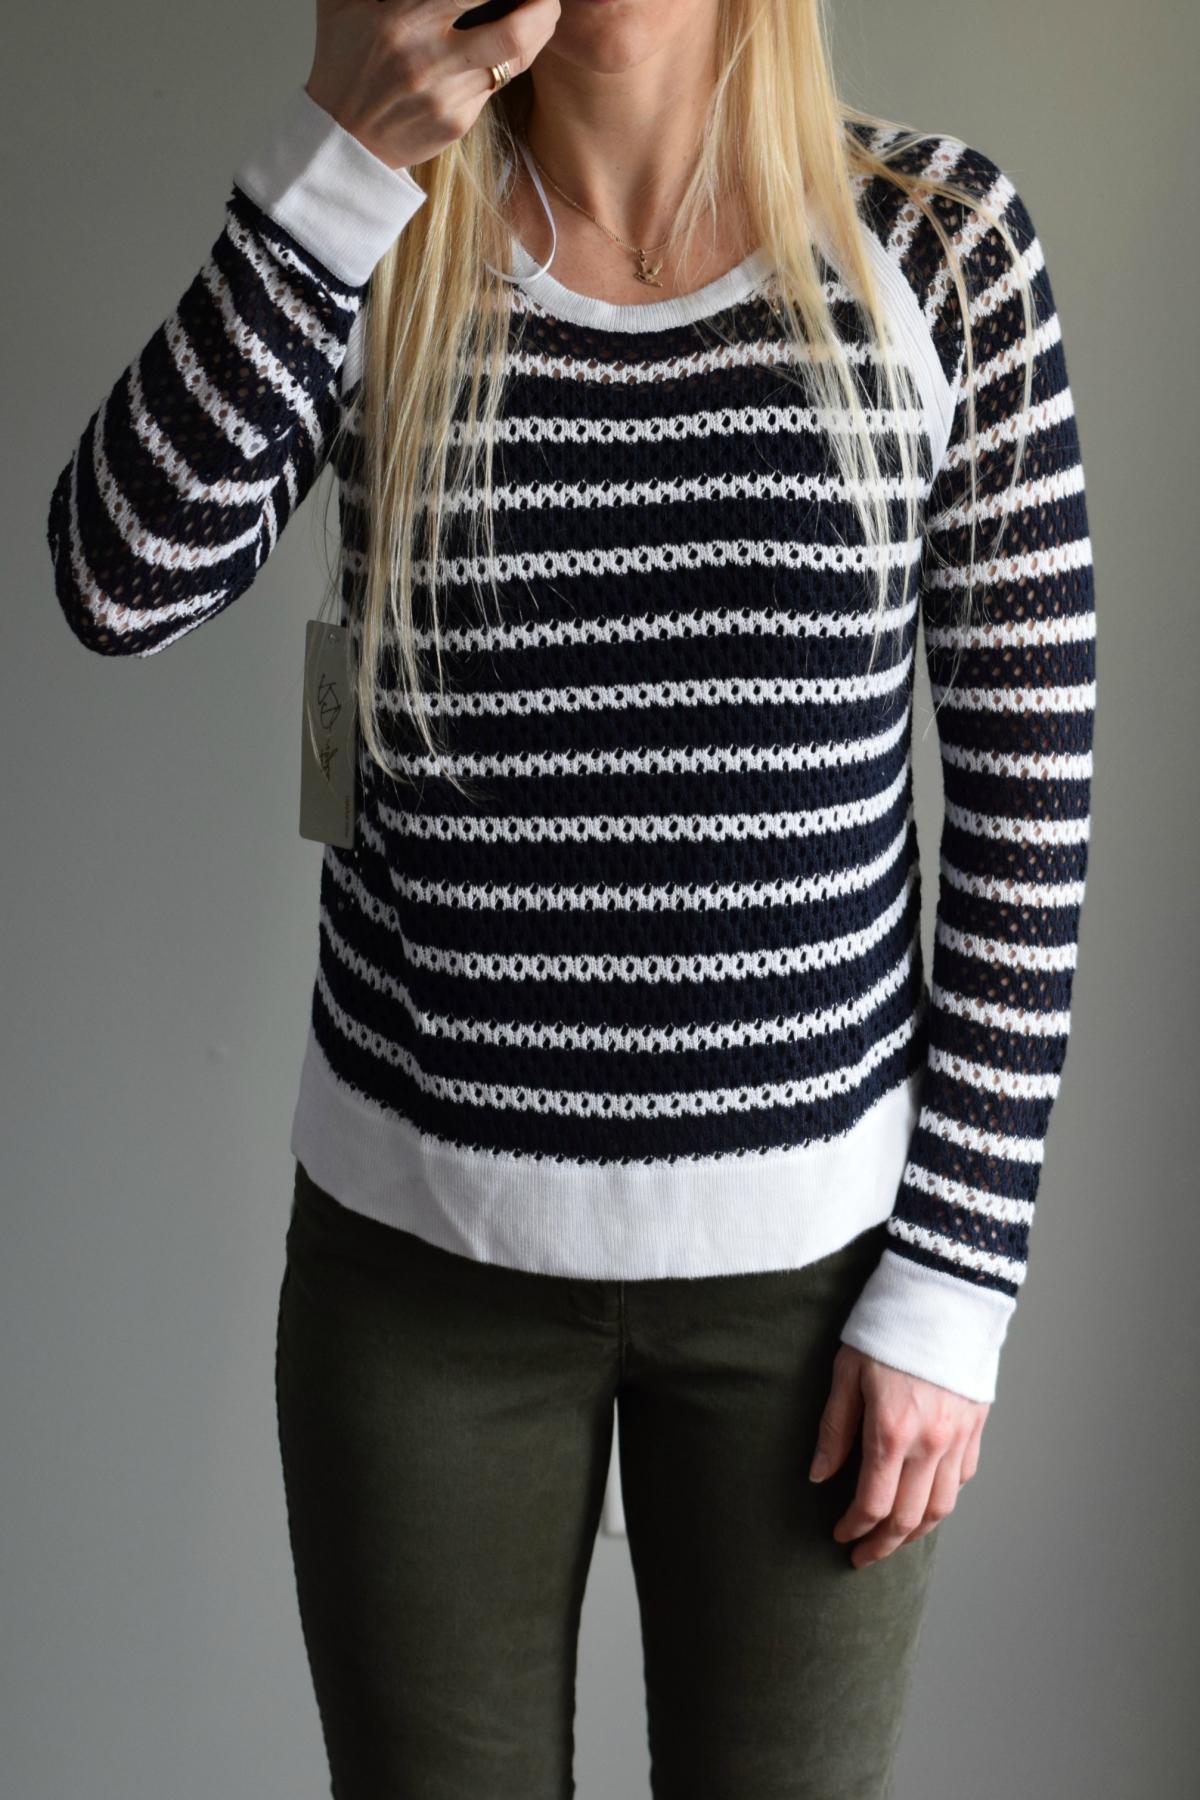 February 2016 Stitch Fix Review: RD Style Hollen Raglan Pullover Sweater |www.pearlsandsportsbras.com|